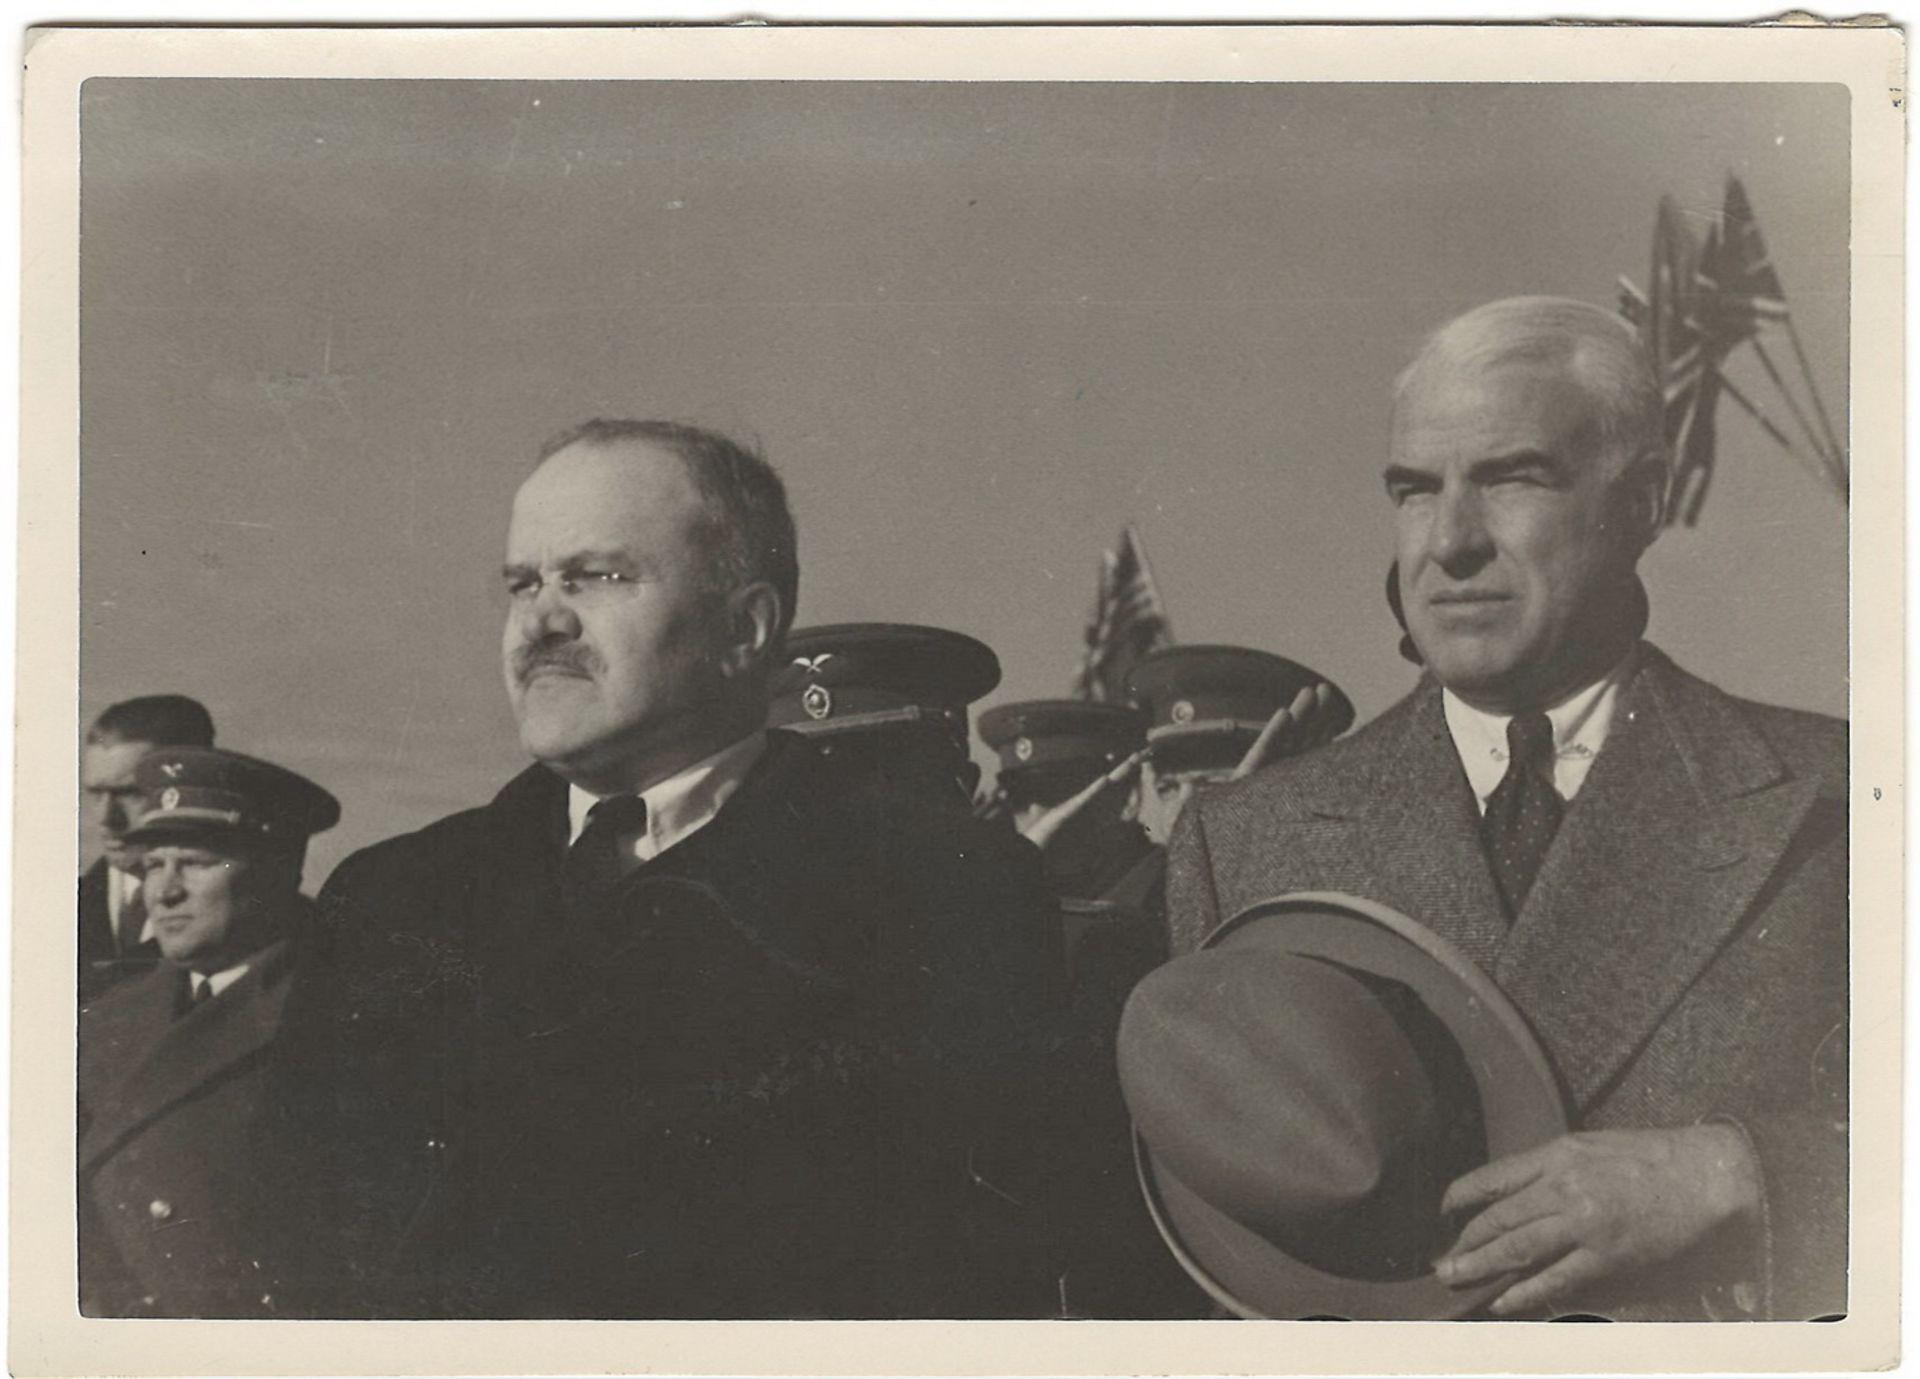 [Soviet]. Vyacheslav Molotov and Edward Stettinius Jr. on Yalta Conference. Photograph. 1945.<br>10x